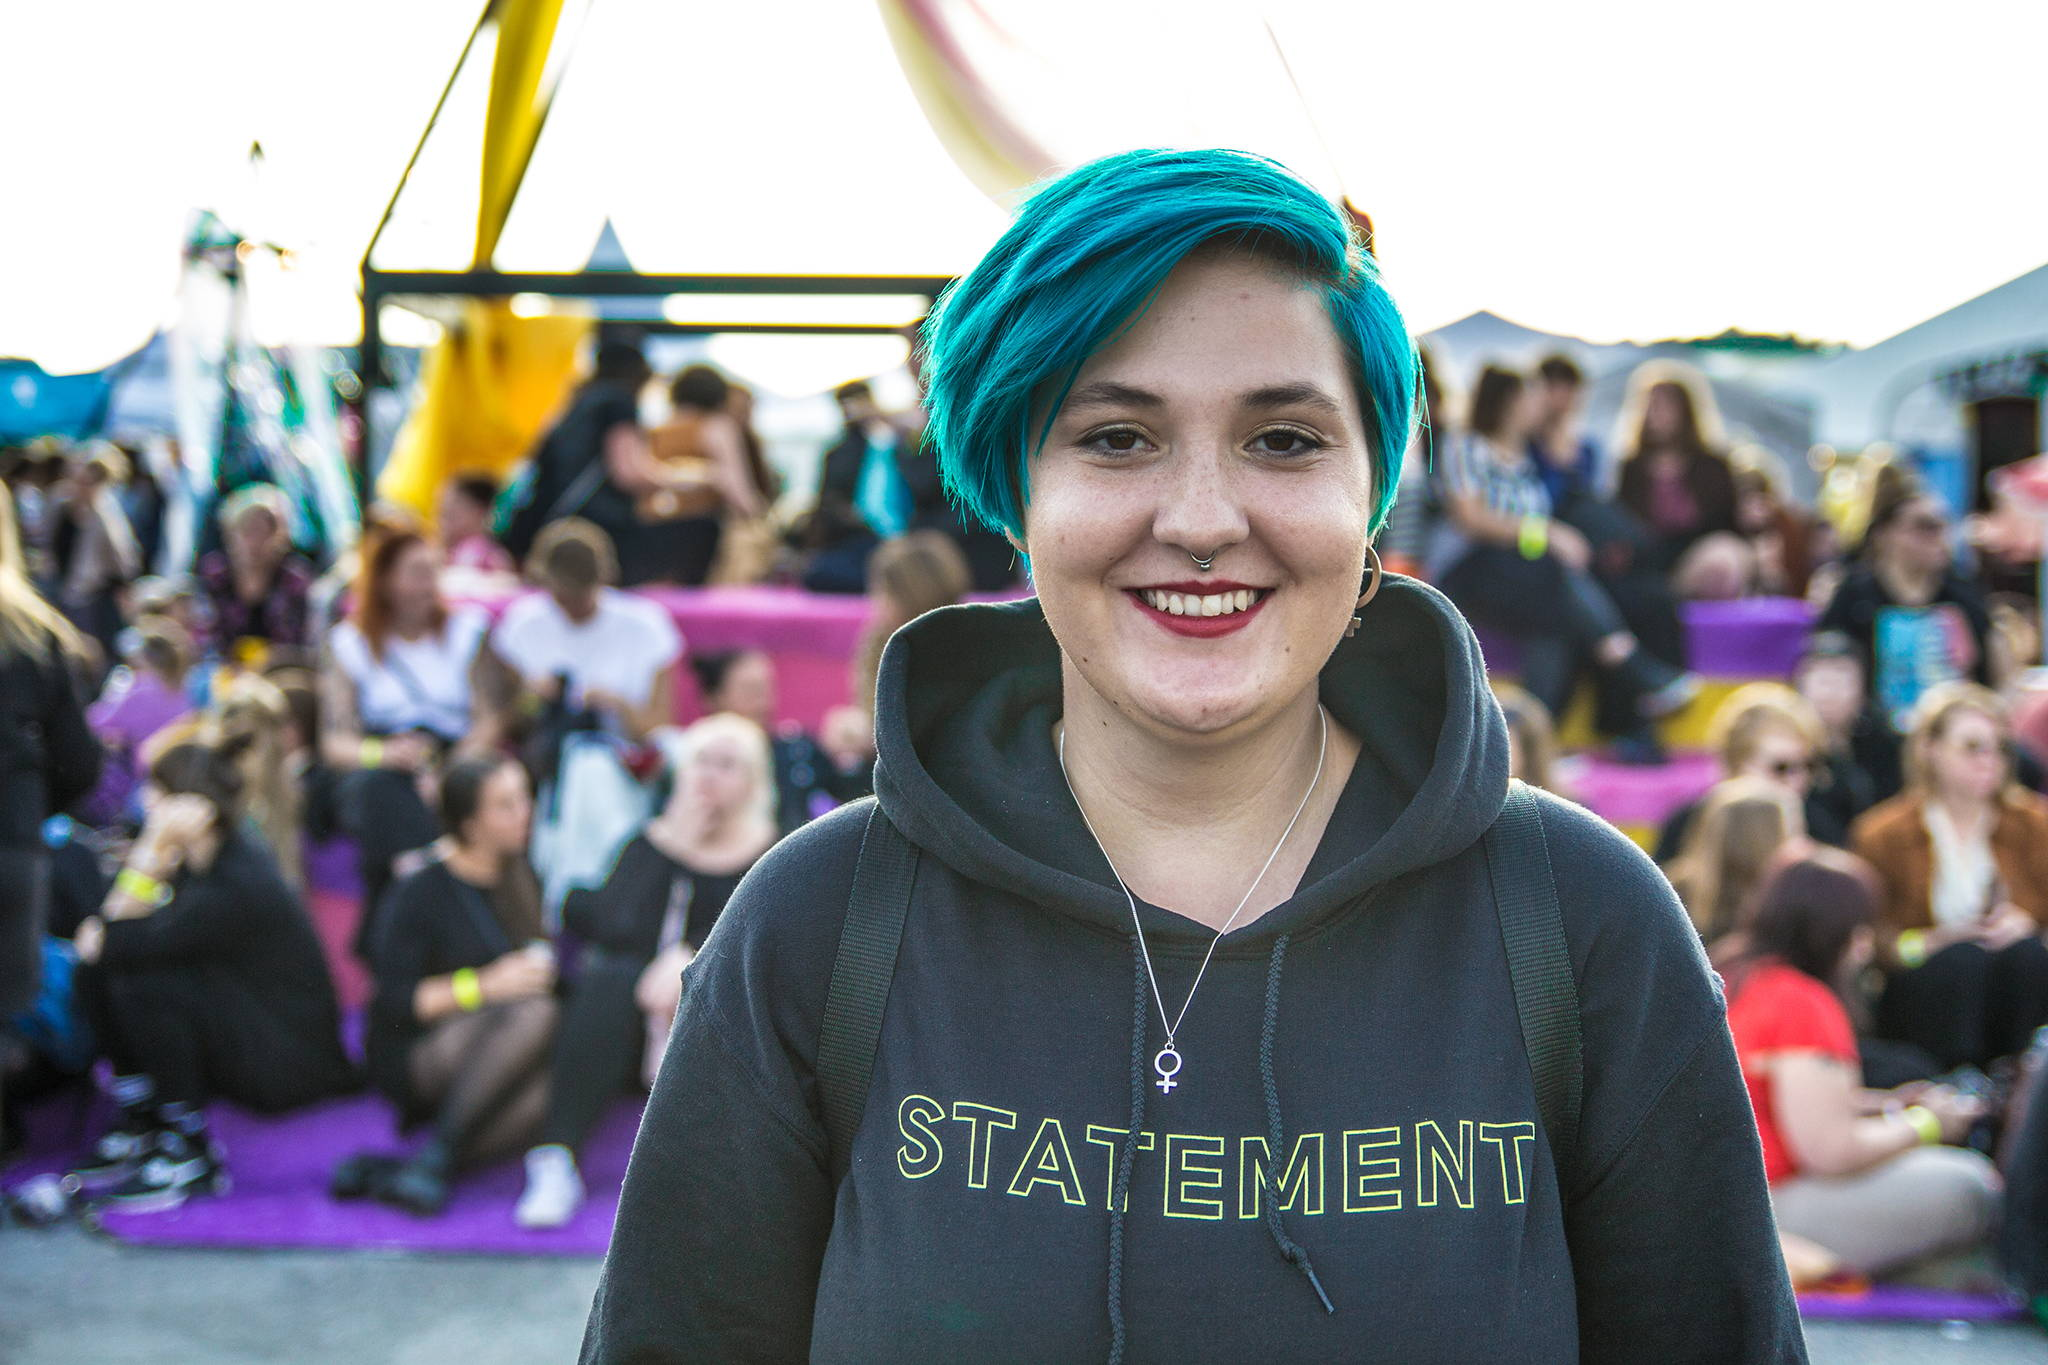 Statement Festival Photo: Sandra Backlund, SallyHill